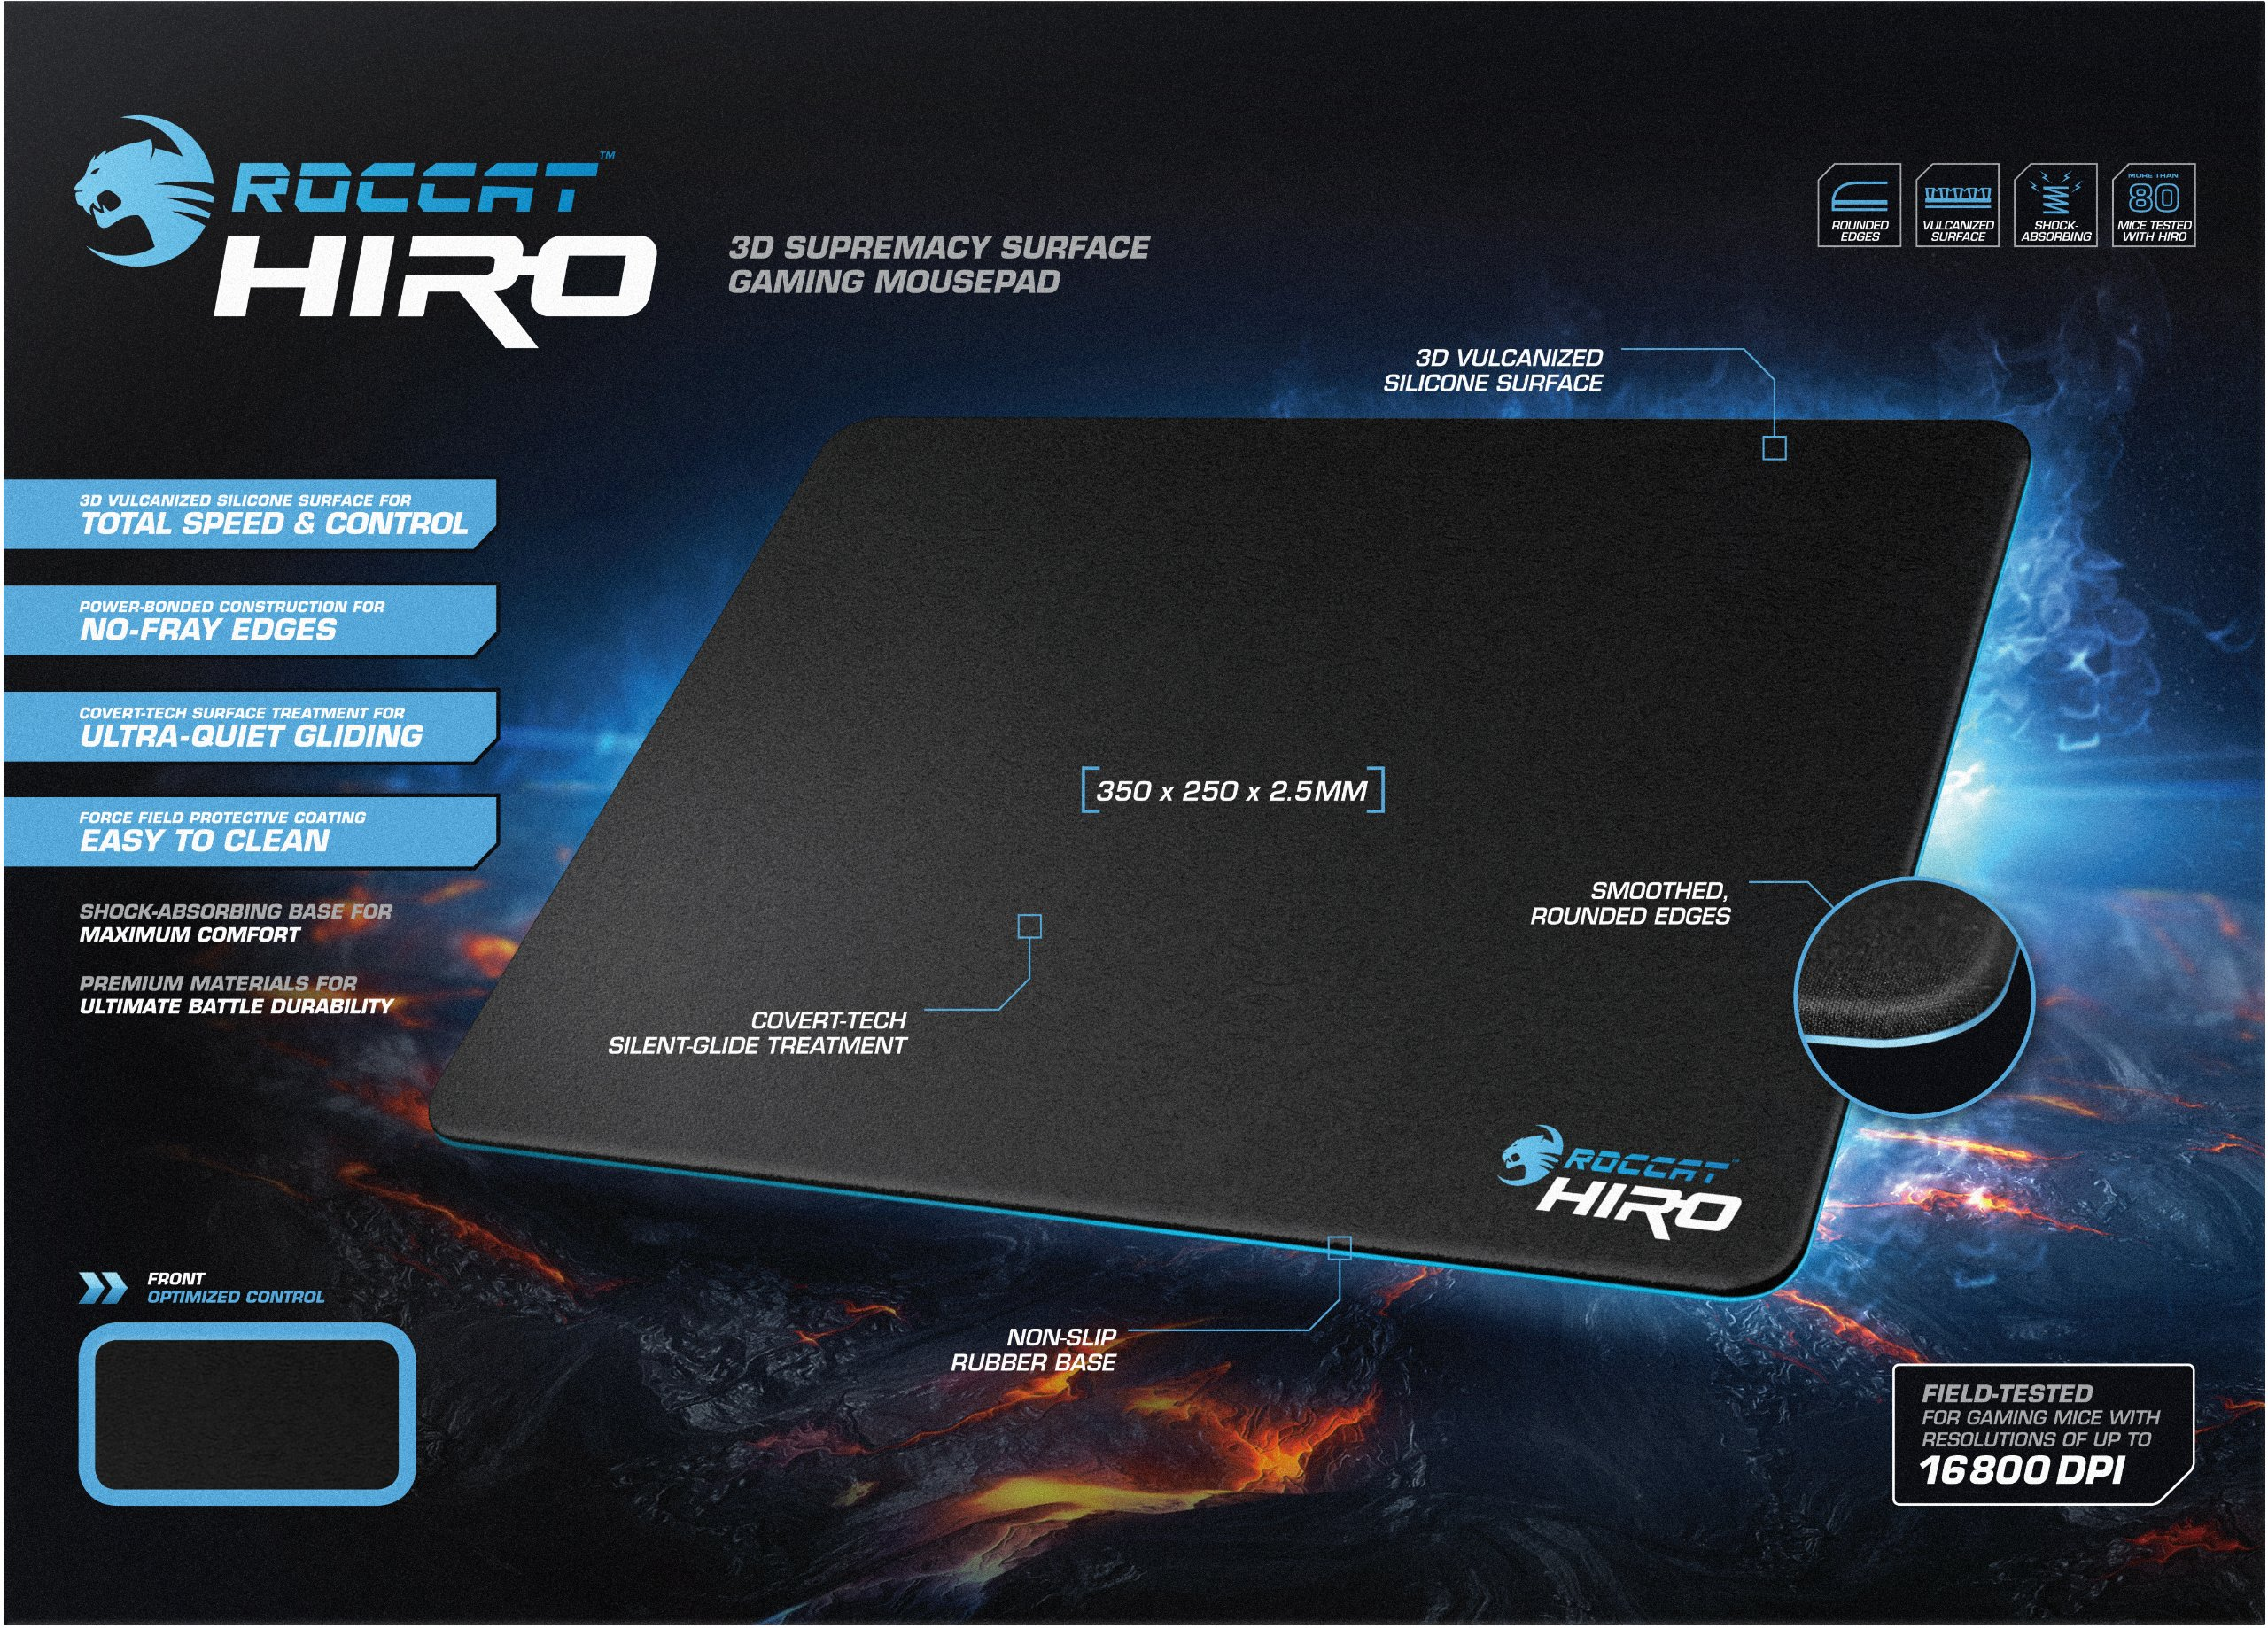 ROCCAT HIRO 3D Supremacy Surface Gaming Mousepad, Black